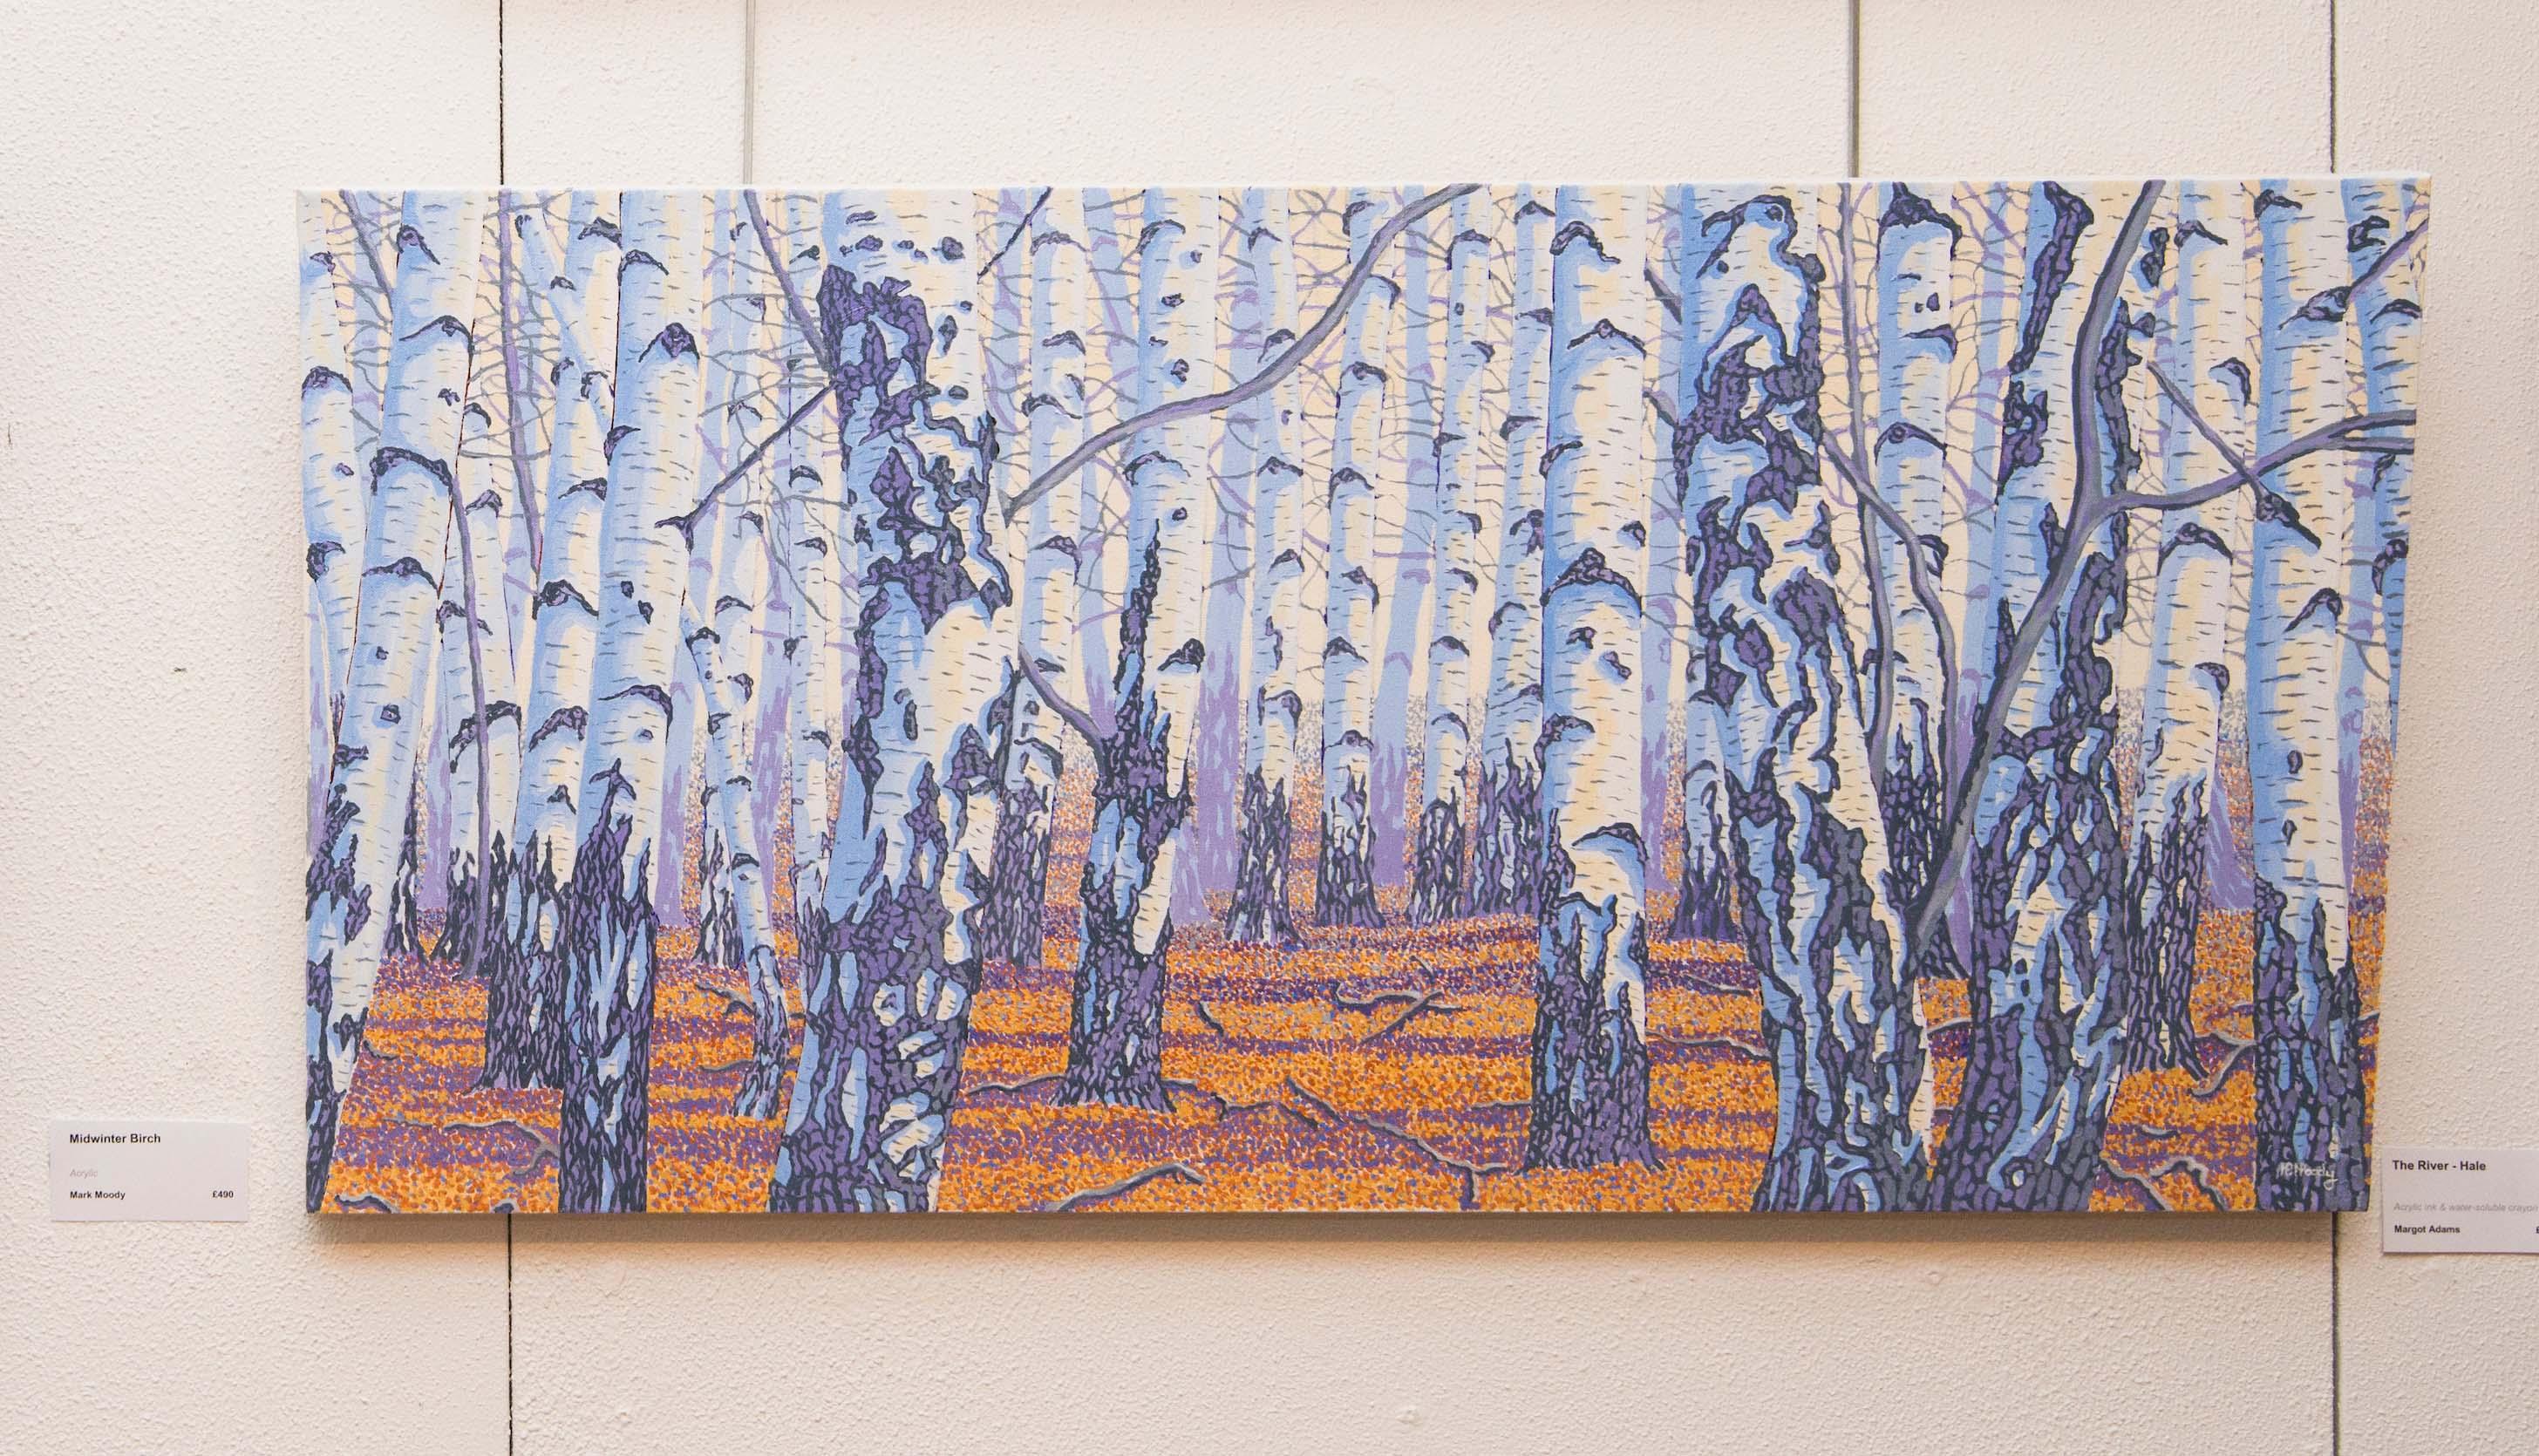 New Forest Open Art people's prize winner 'Midwinter Birch' by Mark Moody